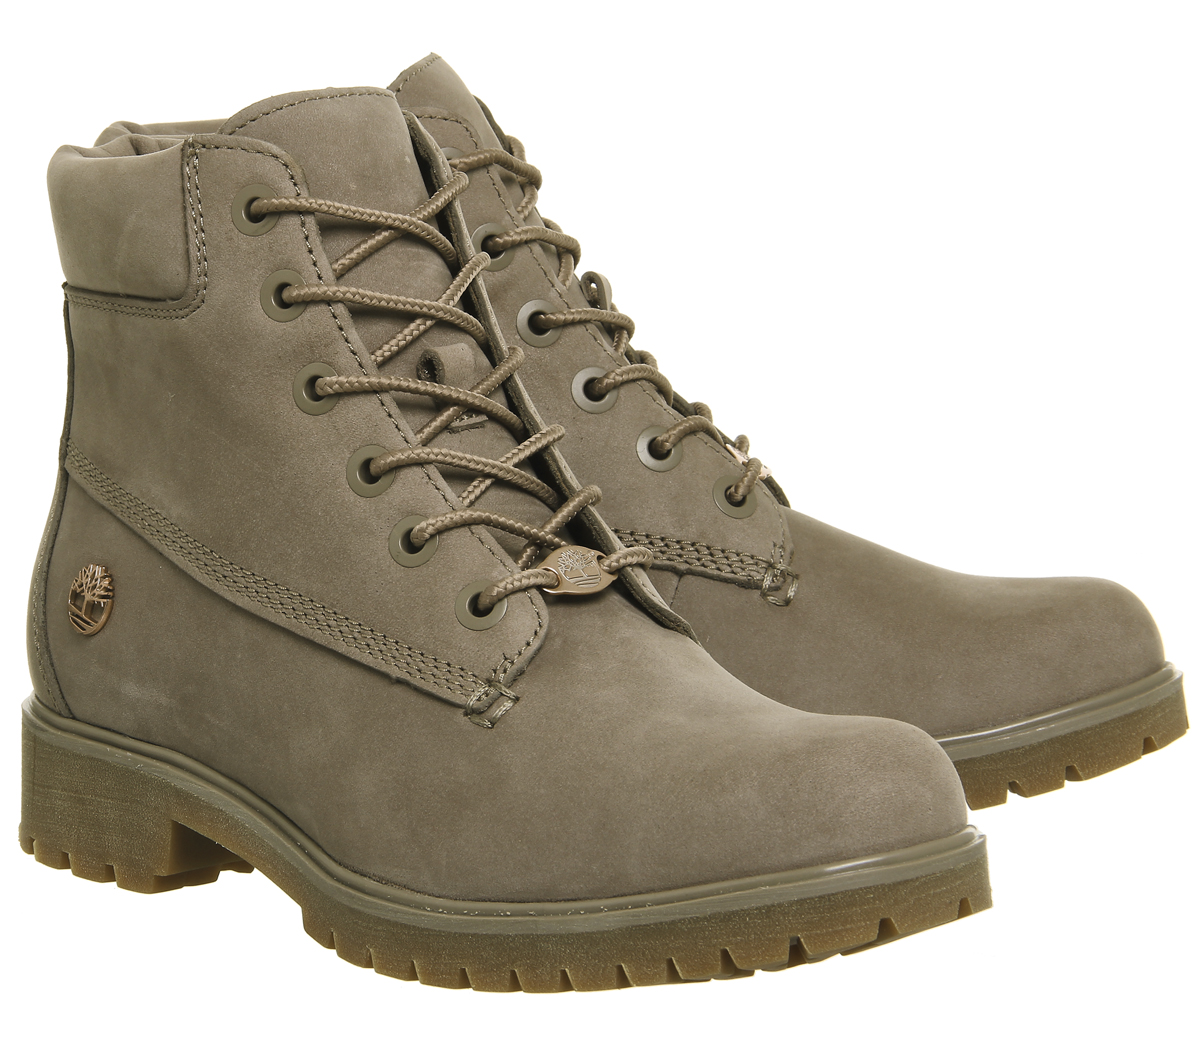 dadd28266cfdc Womens Timberland Slim Premium 6 Inch Boots Pine Bark Nubuck Boots ...